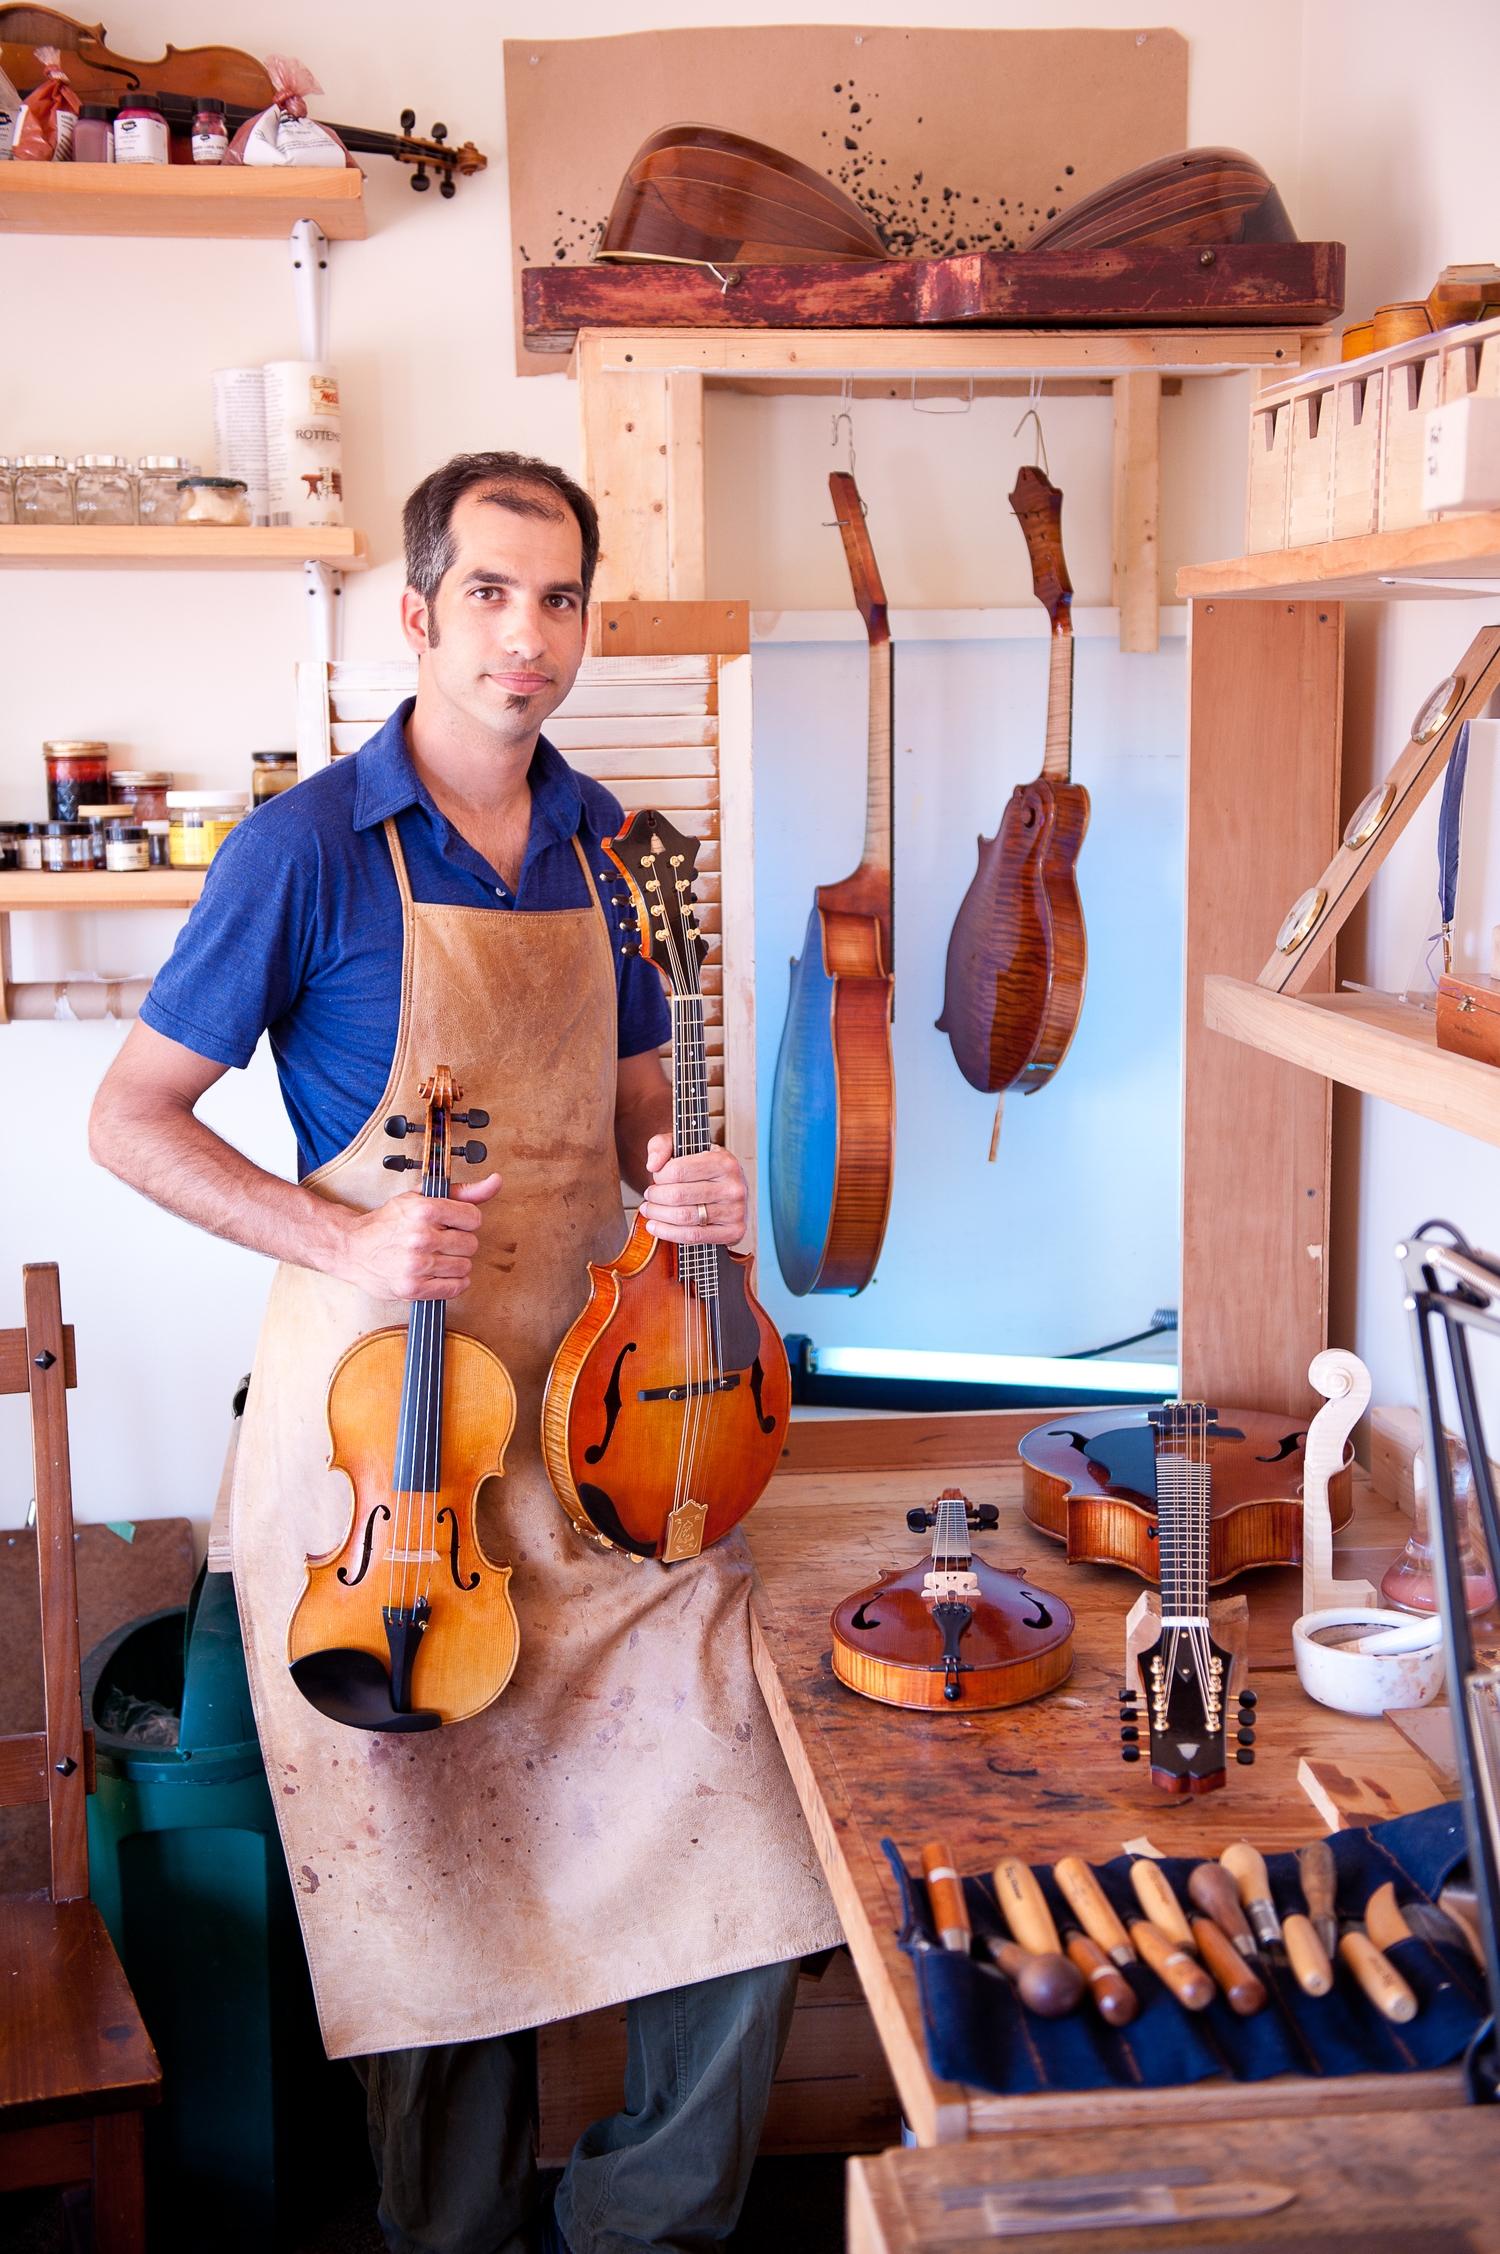 Model's Shown (L-R): Guarneri Model violin, Dué Mandolin, Dué mandola, F-5 Mandolin. Workbench: Dué Piccolo Mandolin, Dué Octave mandolin.